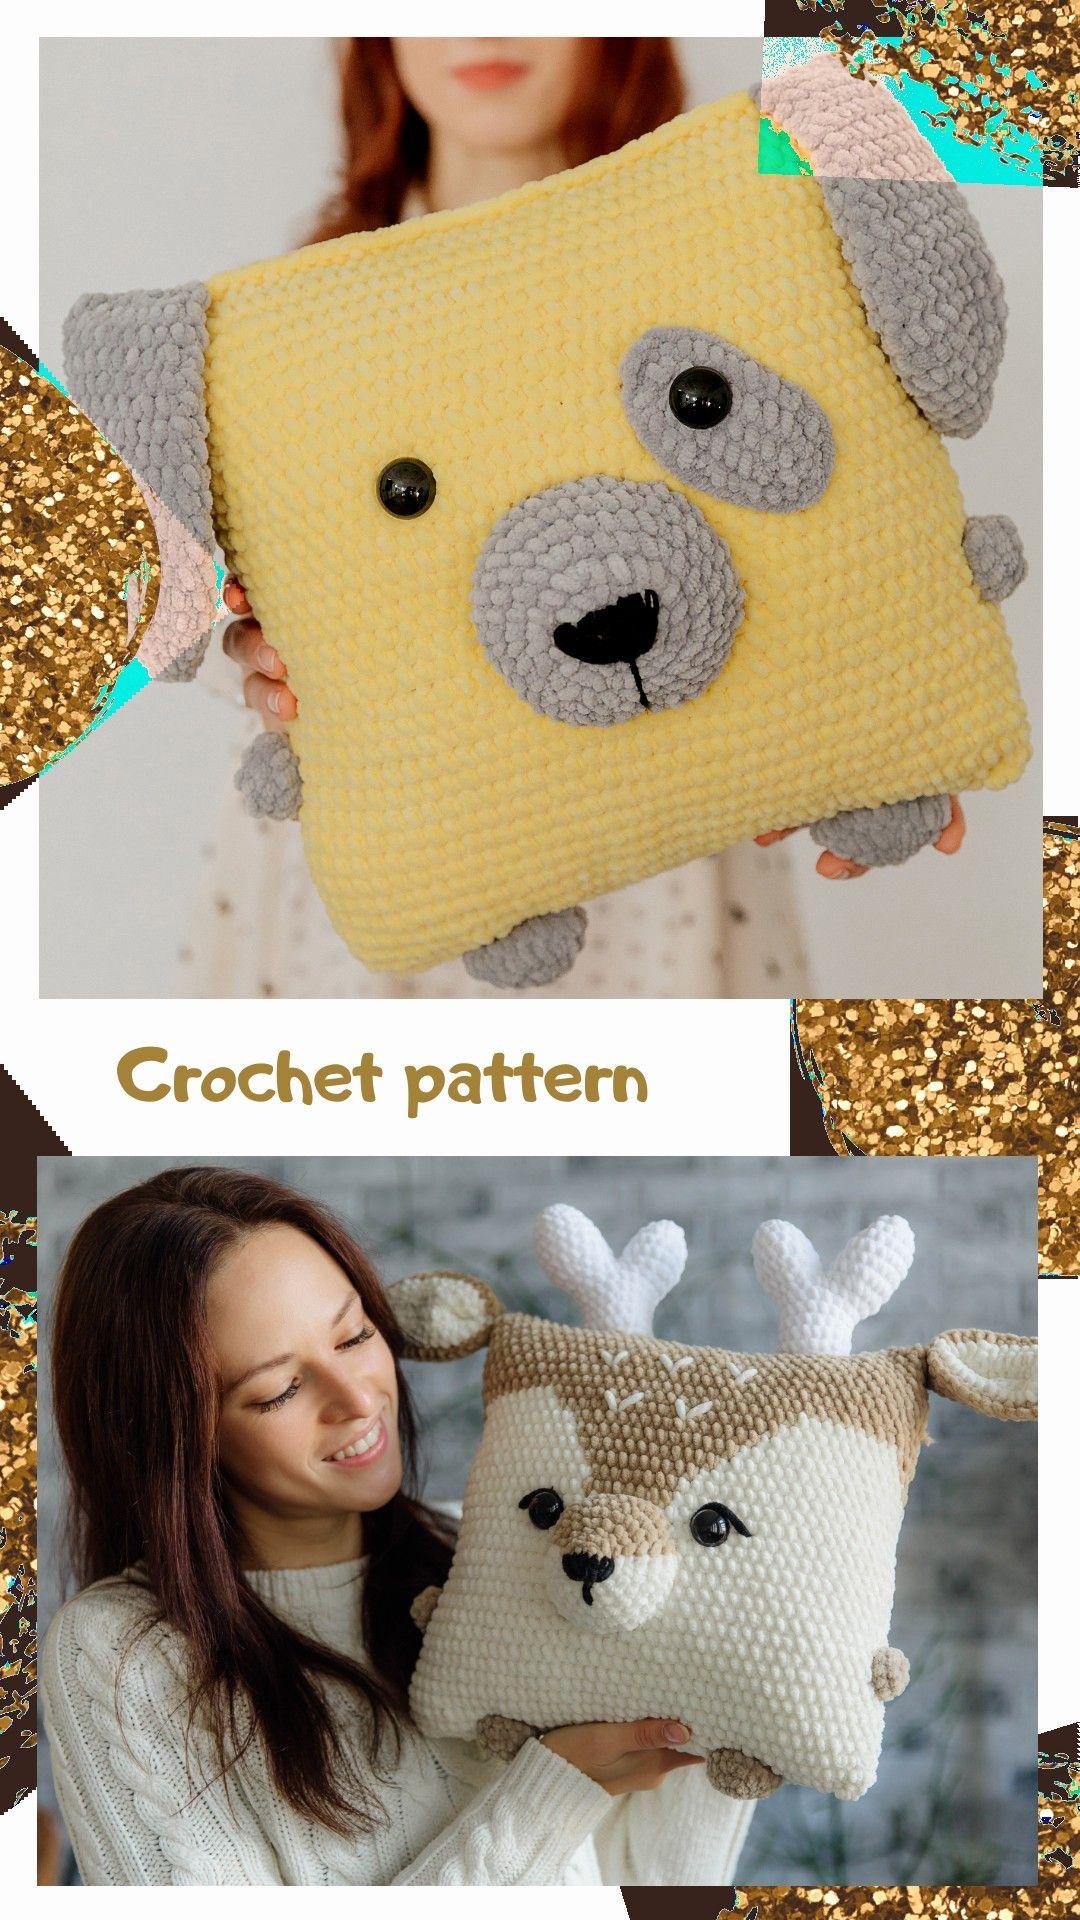 Crochet pattern pillow, amigurumi raindeer, crochet deer, amigurumi dog, crochet christmas gift, pet